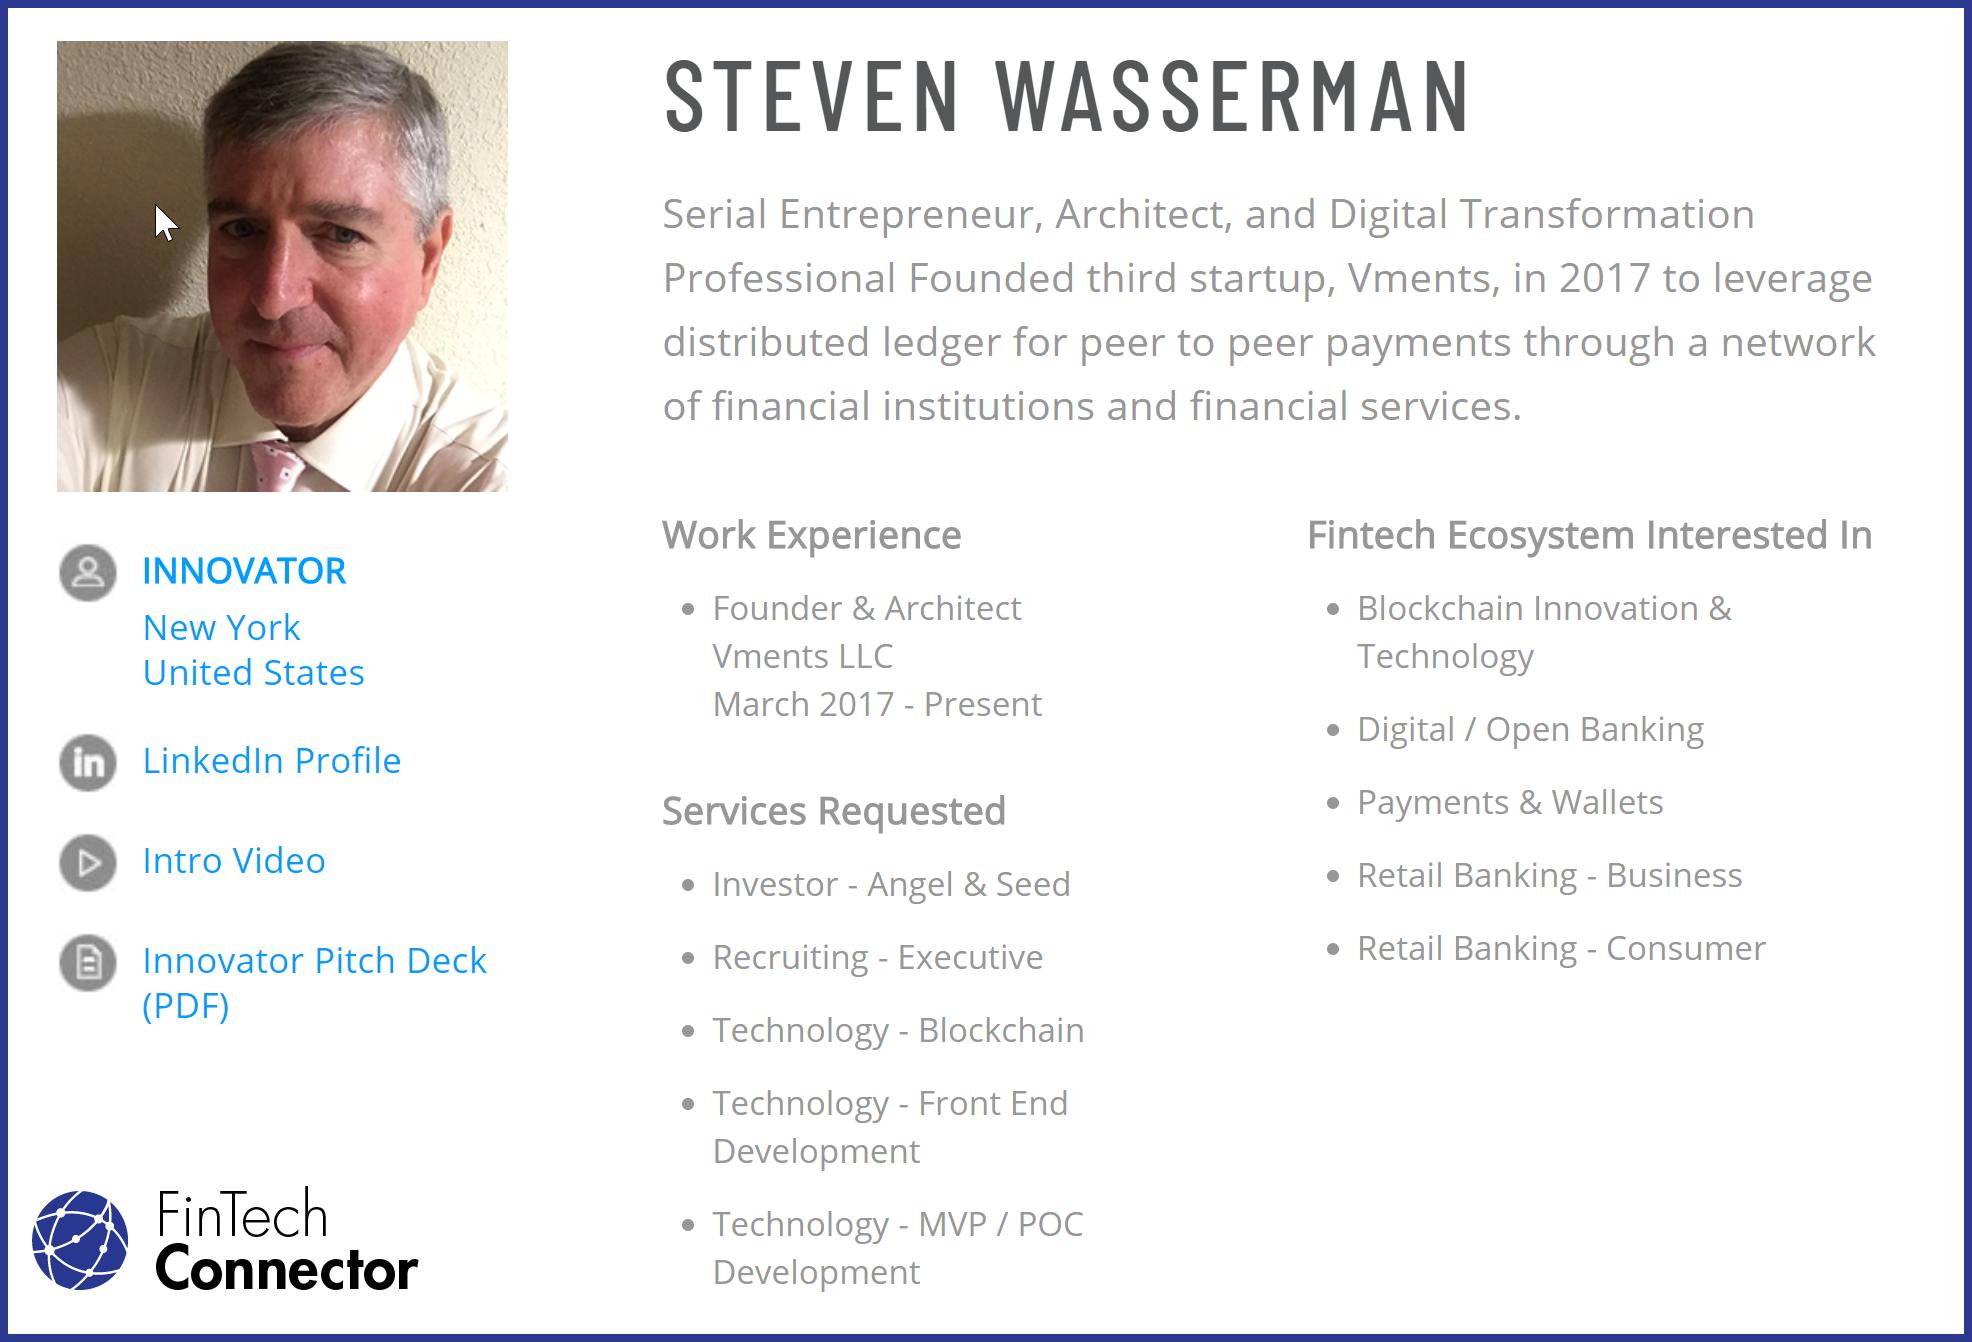 Connect with Steve Wasserman via FinTech Connector